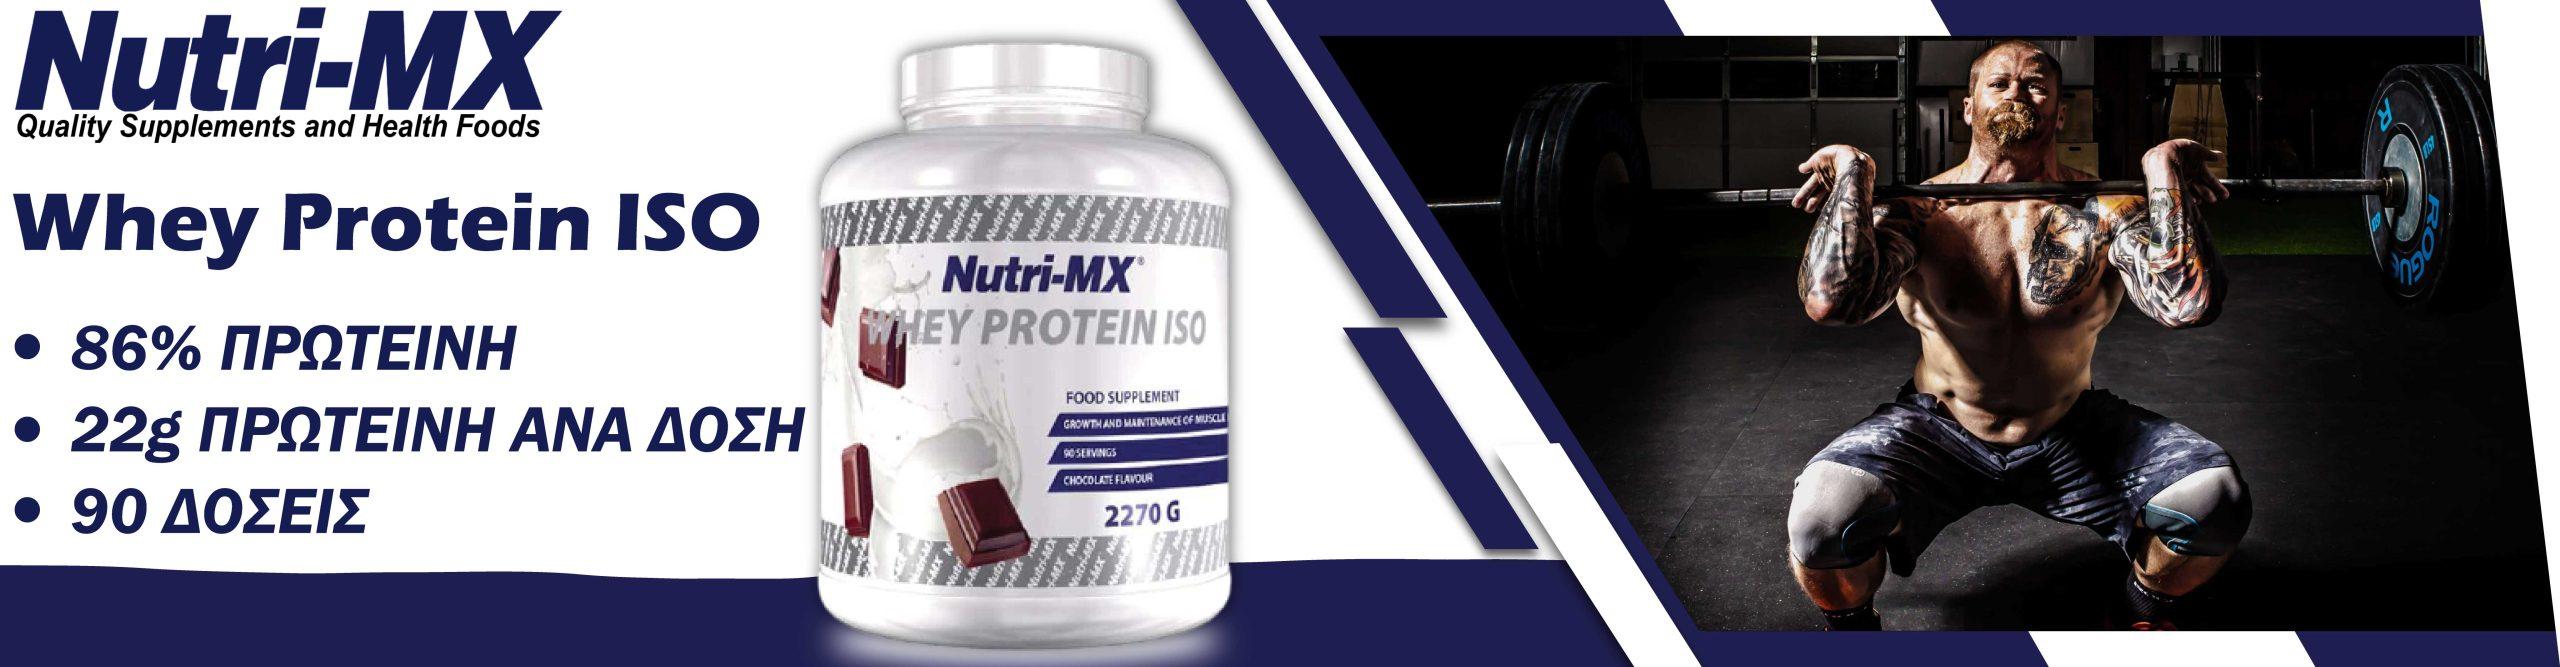 Nutri-MX Whey Protein Isolate